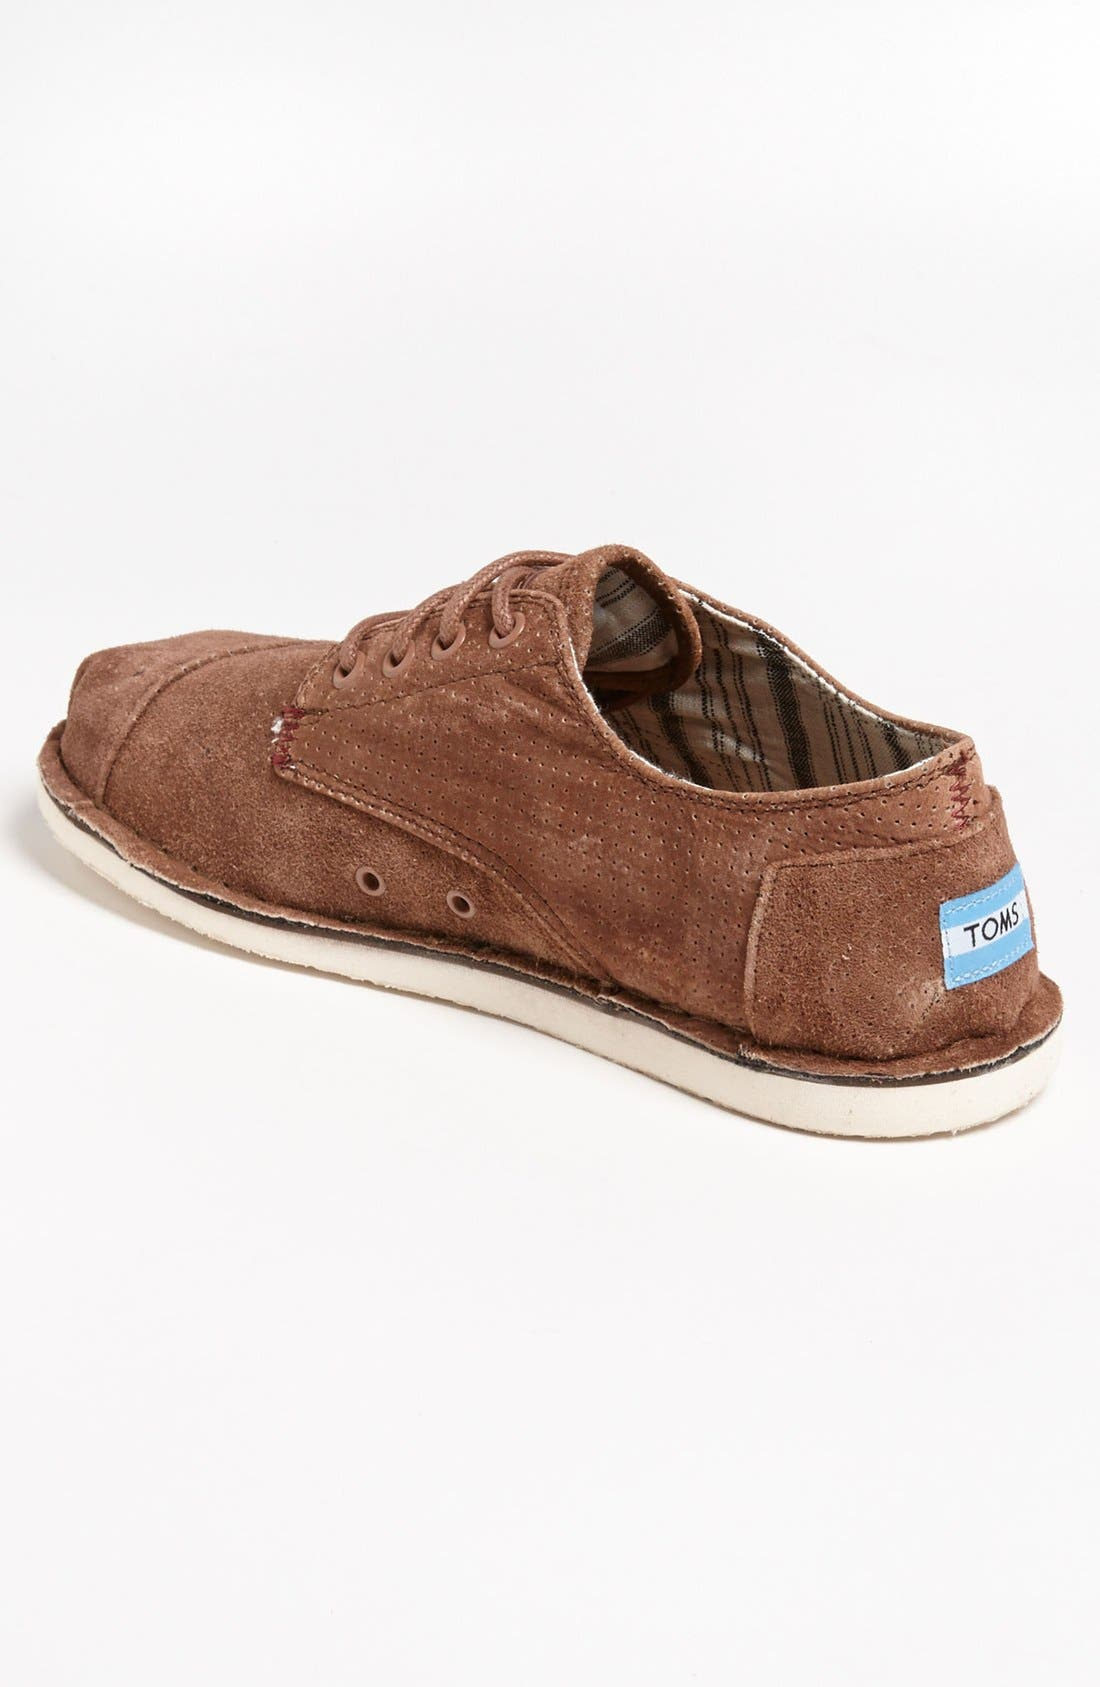 Alternate Image 2  - TOMS 'Desert' Perforated Suede Sneaker (Men)